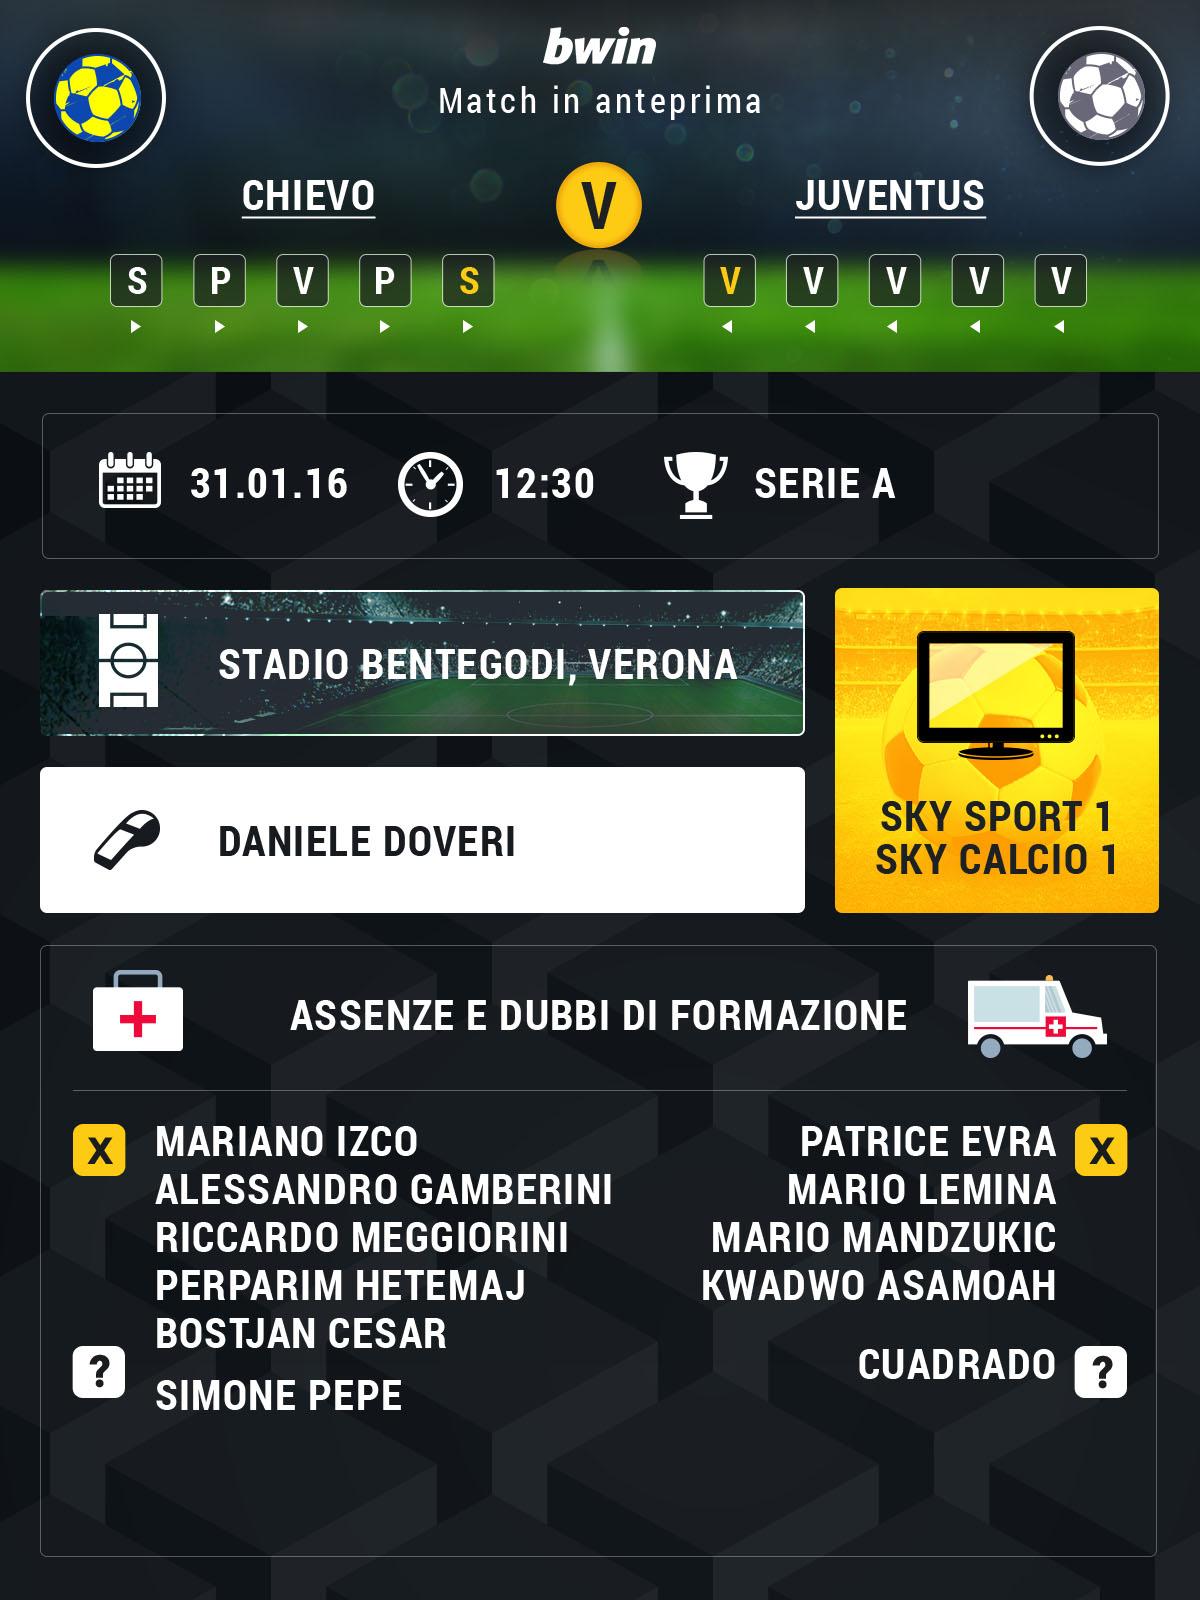 Chievo-Juve preview